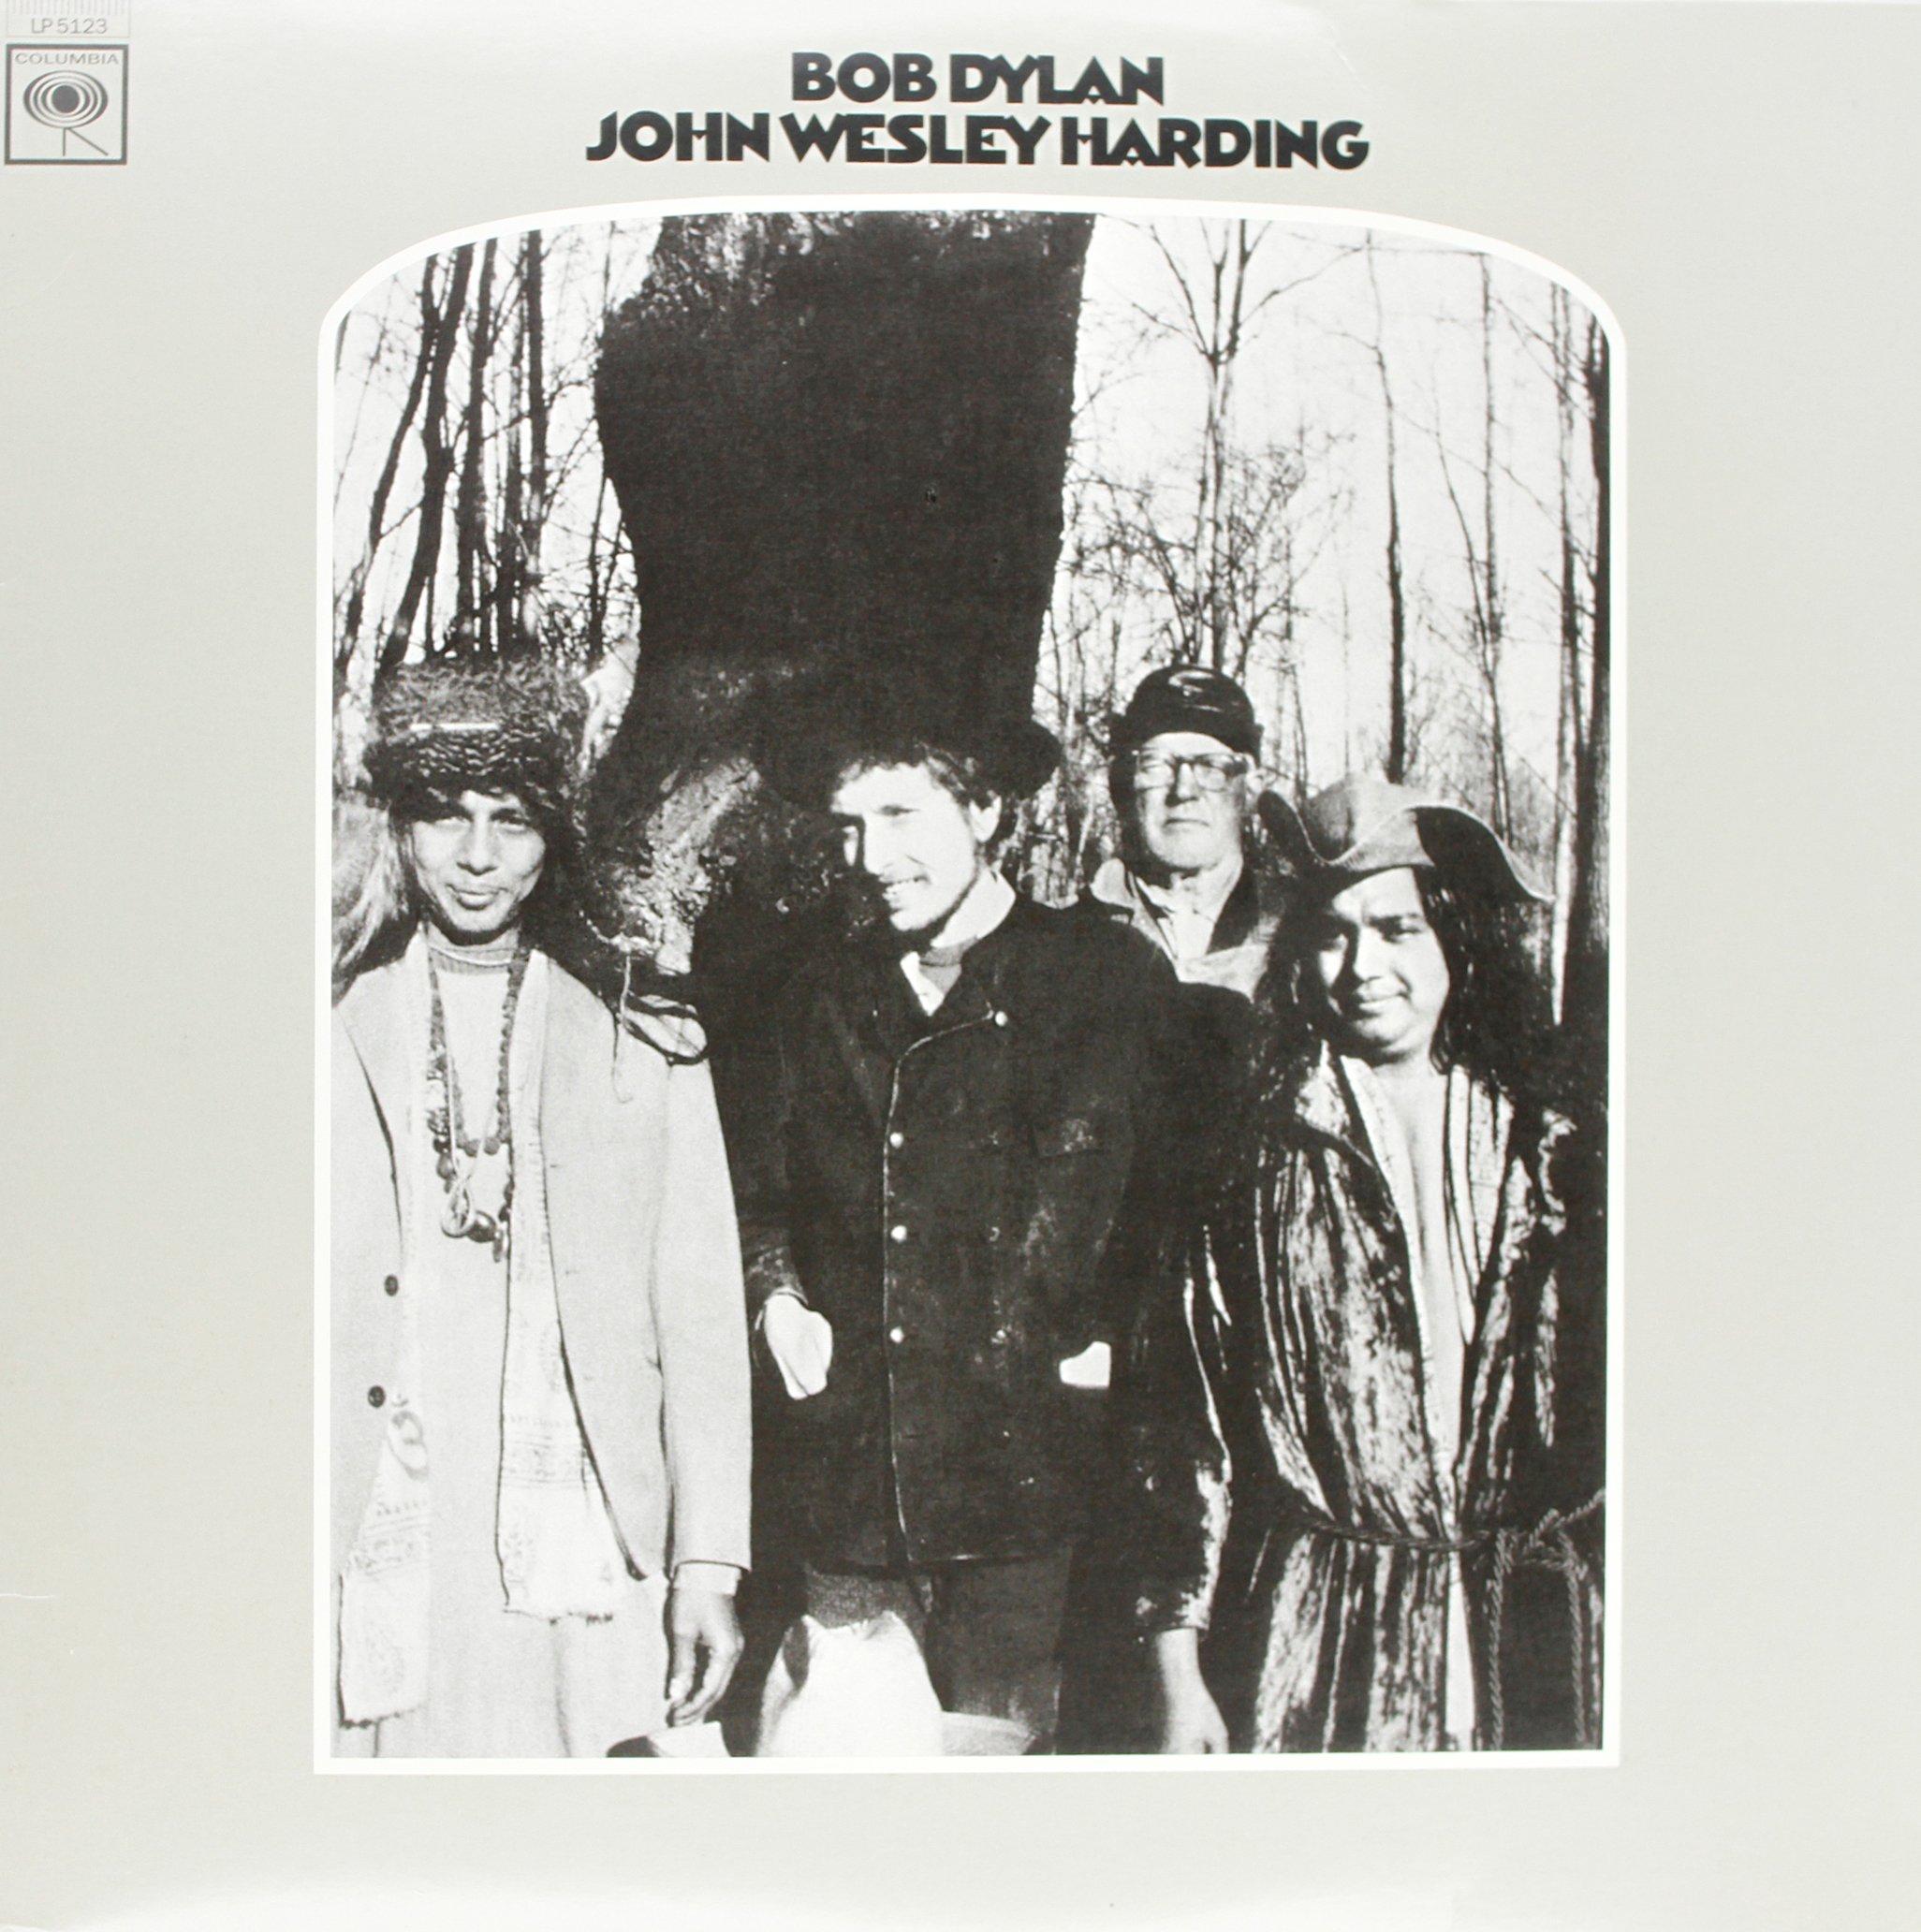 John Wesley Harding (180 gm Vinyl) by Dylan, Bob